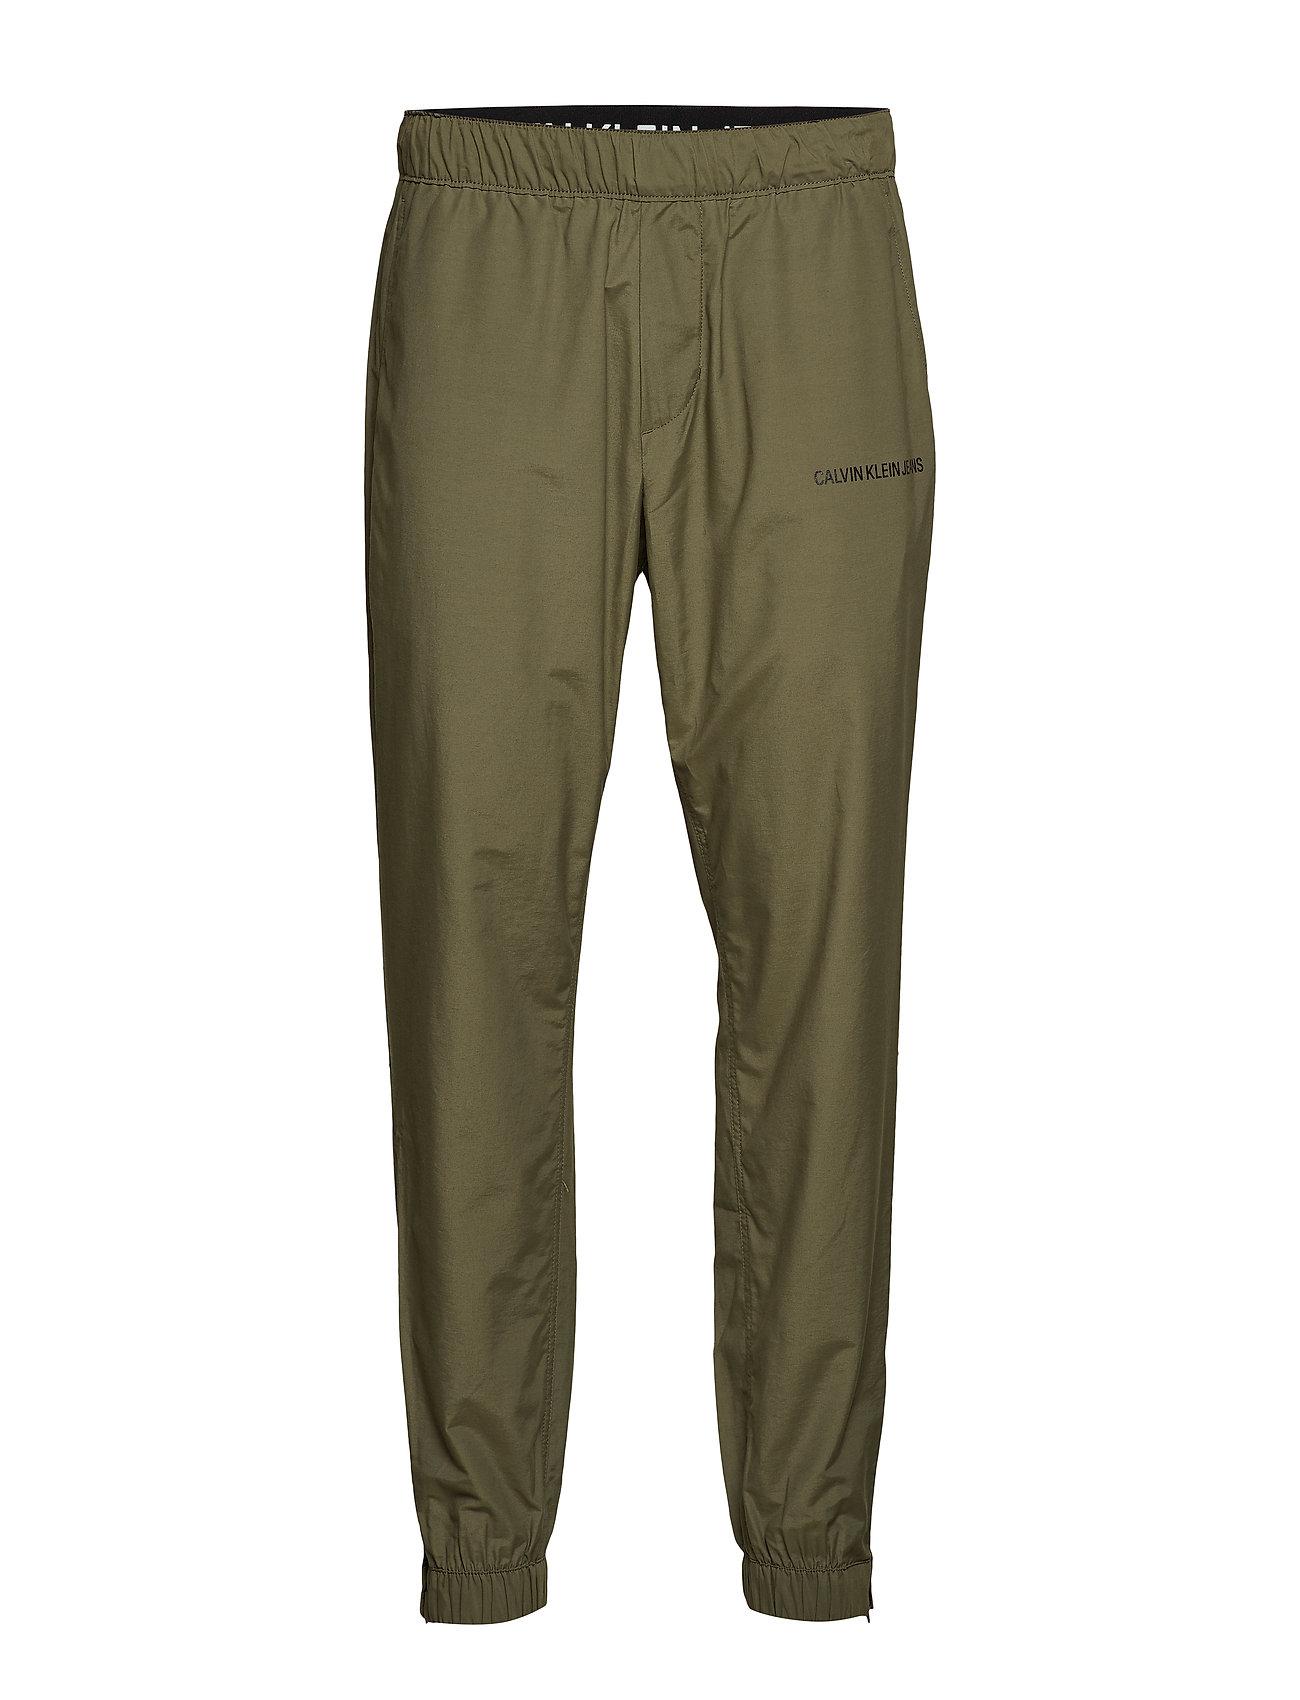 Calvin Klein Jeans COTTON NYLON TRACK P - GRAPE LEAF